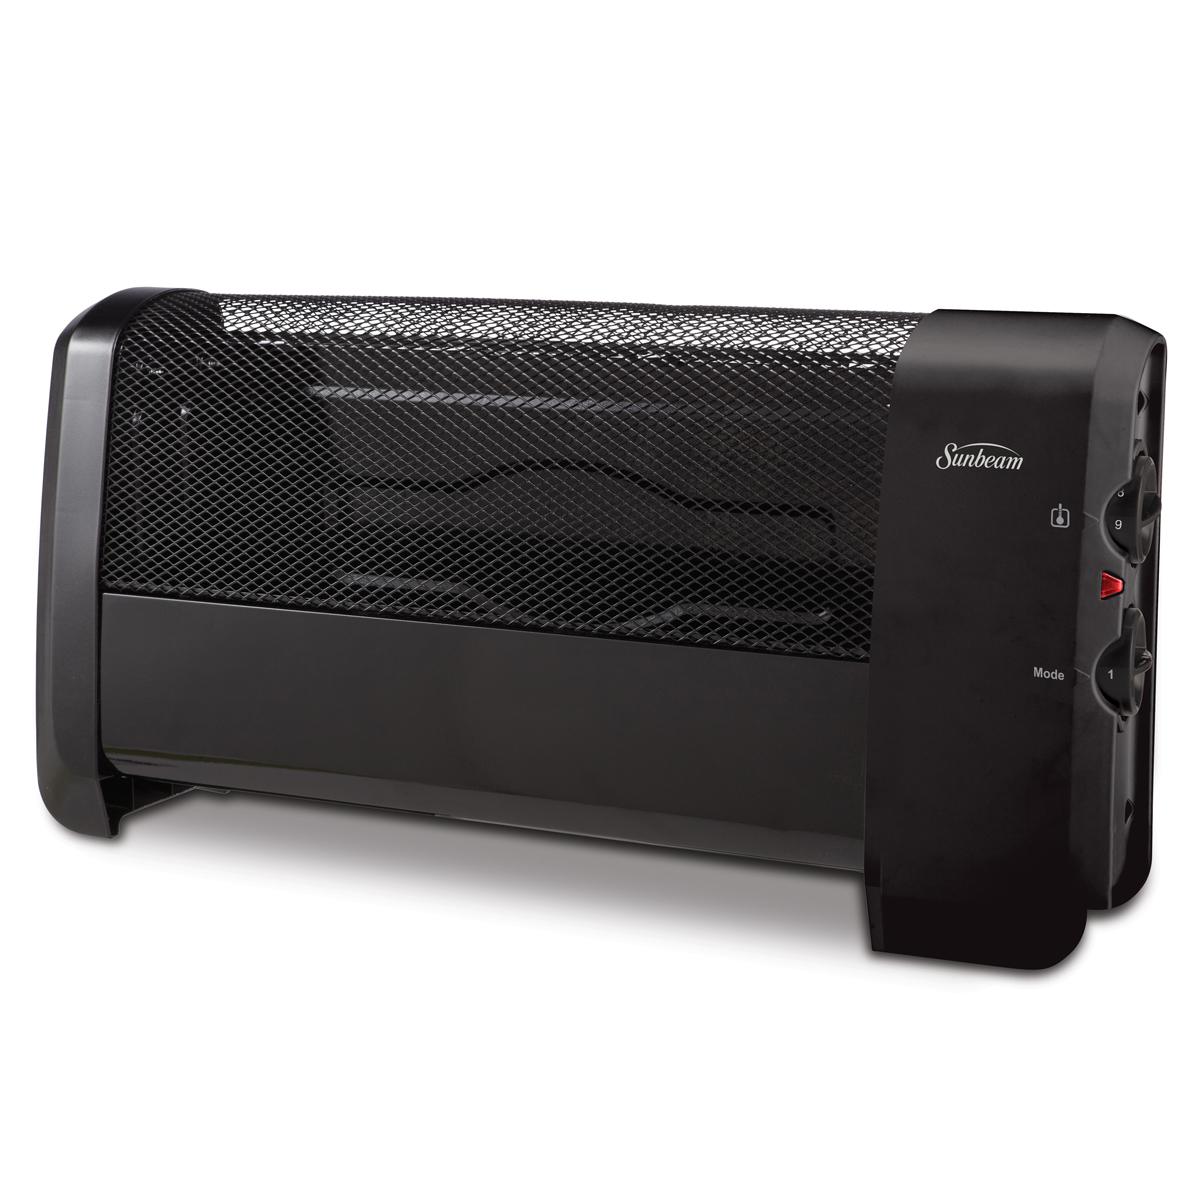 Sunbeam 174 Low Profile Heater With Manual Controls Black